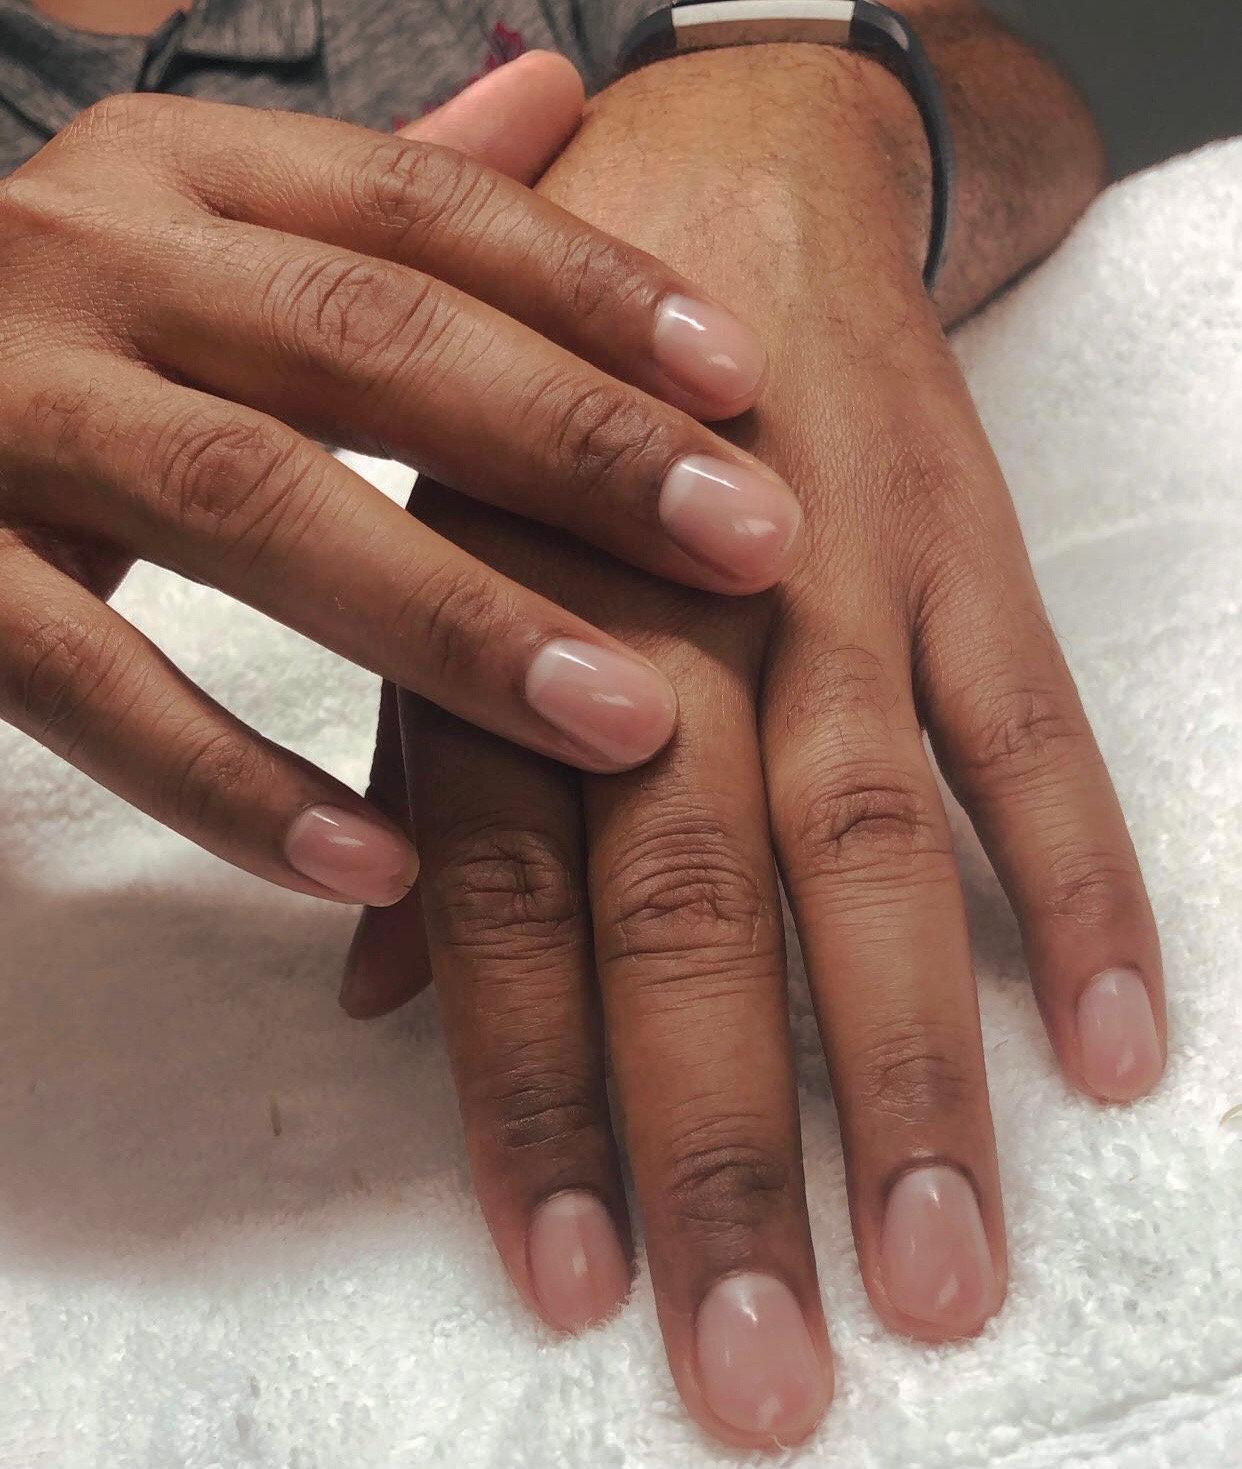 Gentlemen's manicure & pedicure